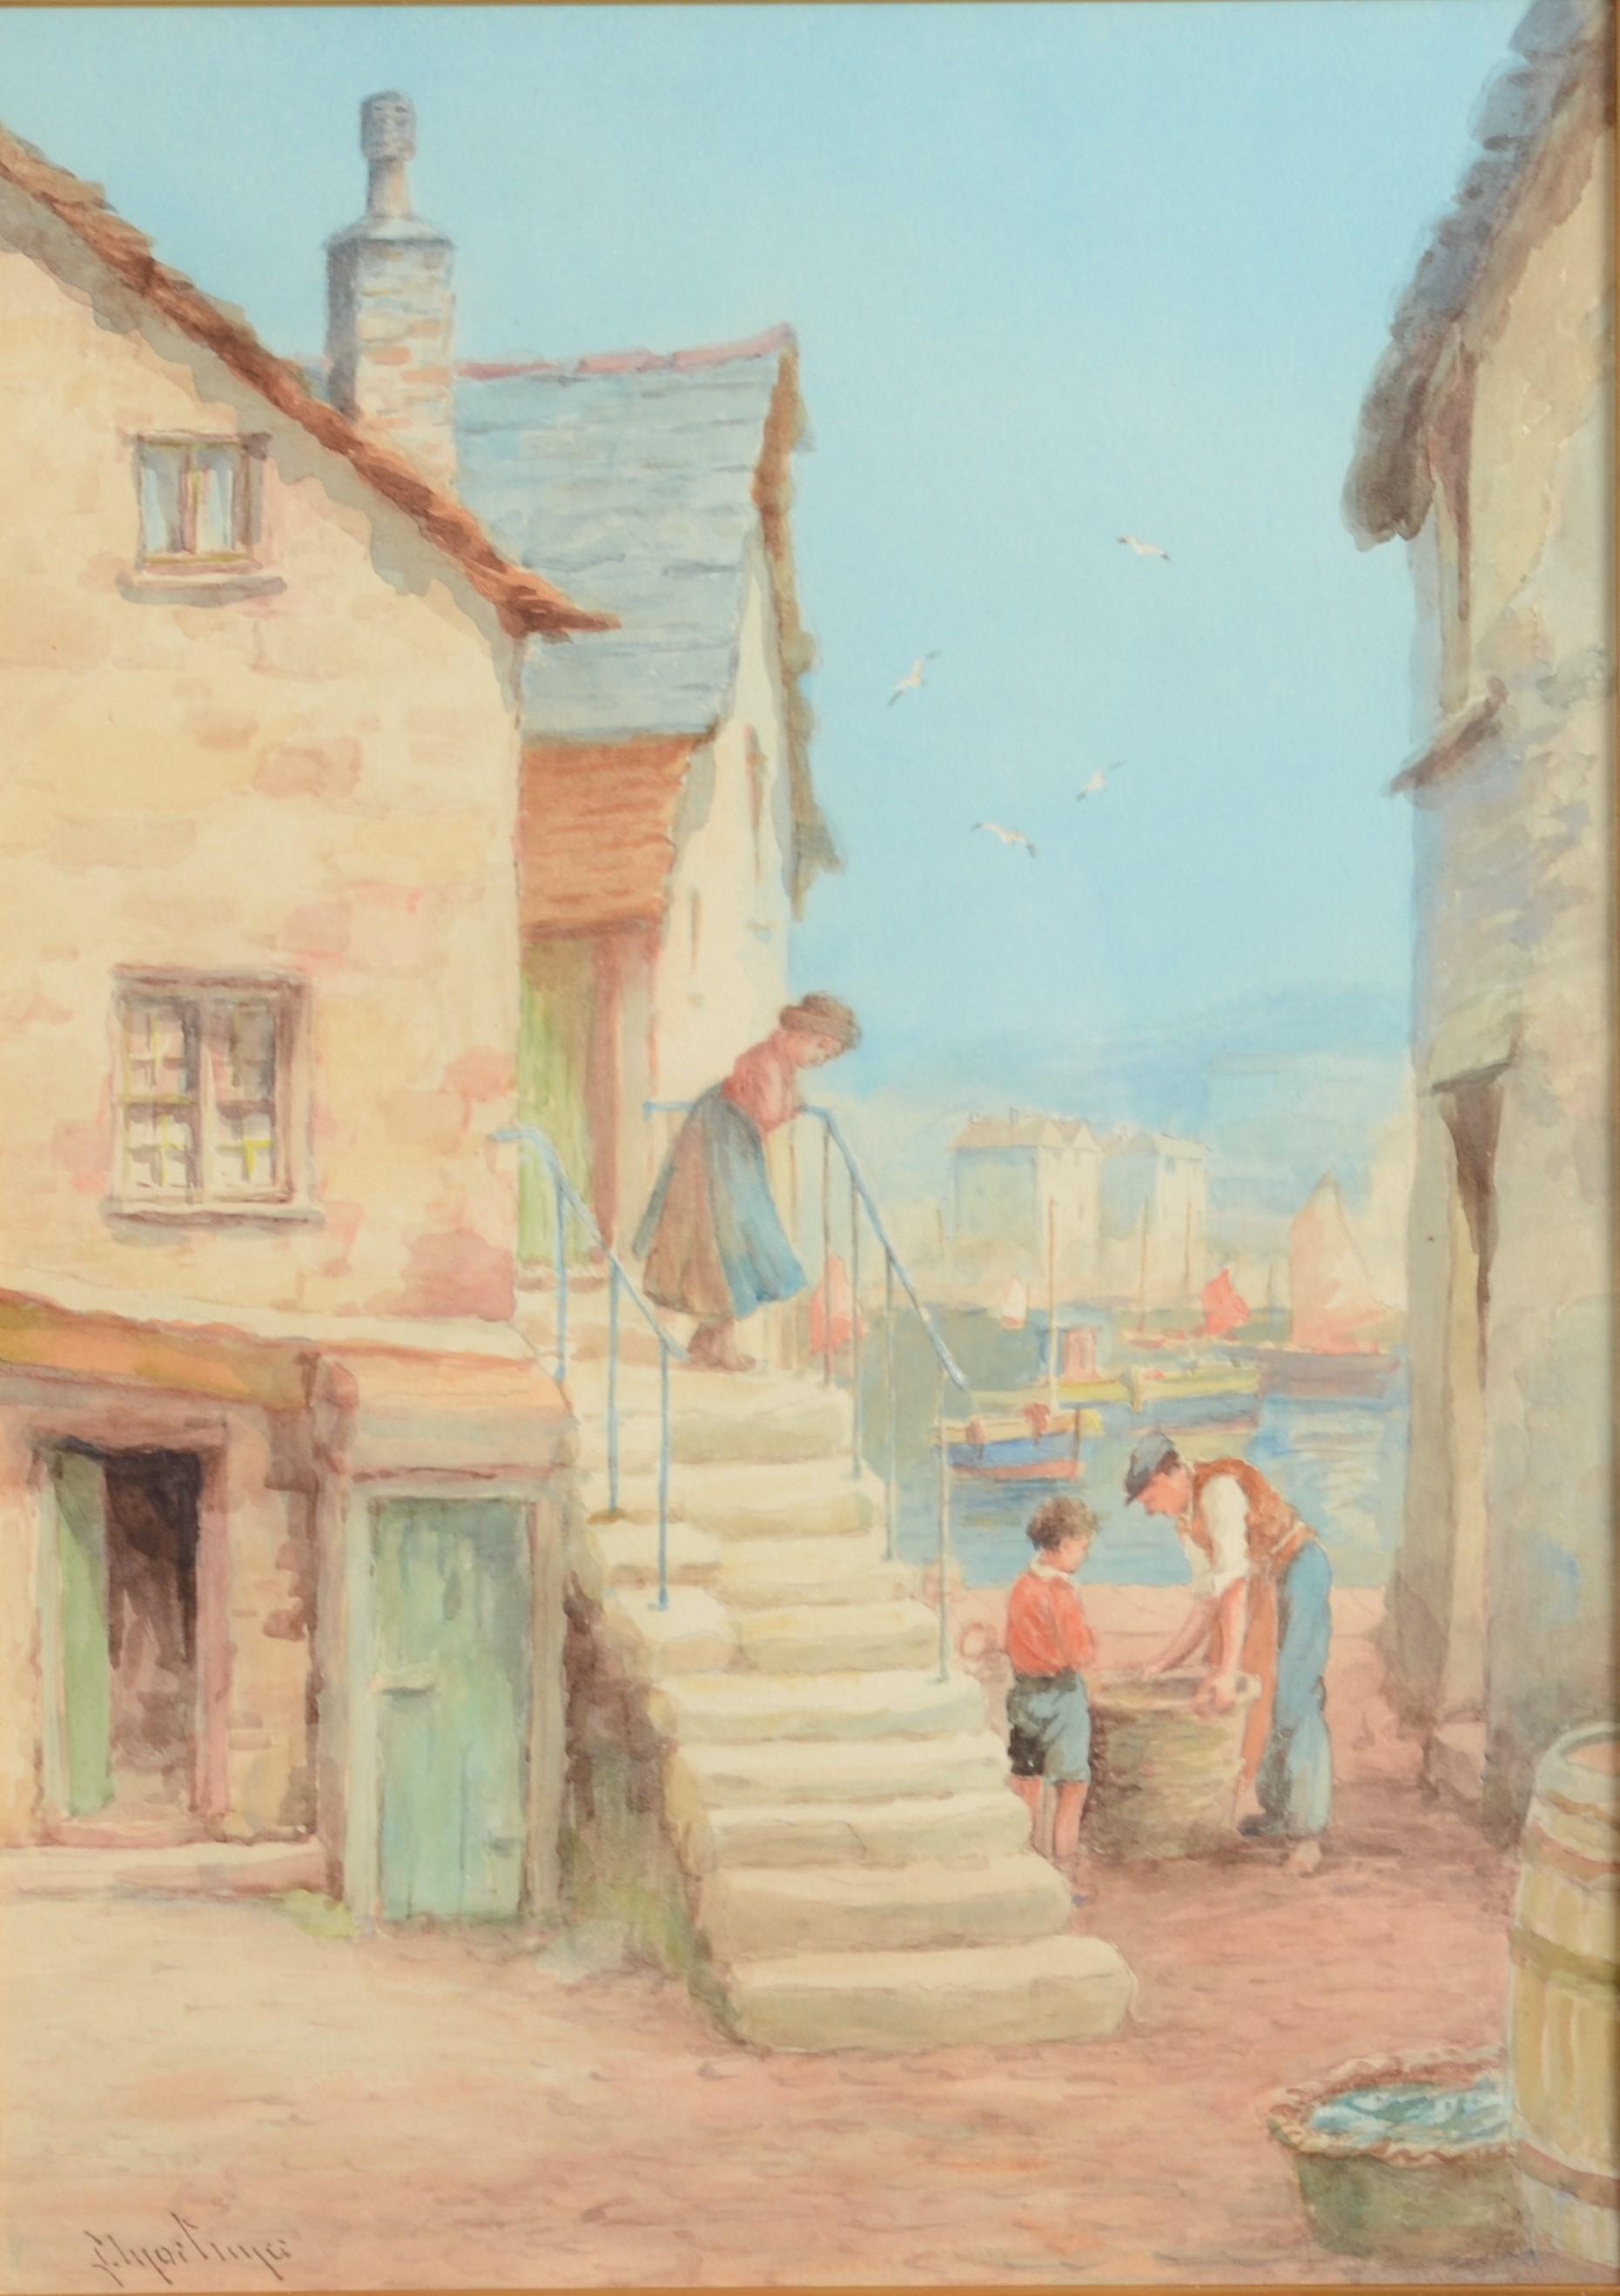 Lot 22 - LEWIS MORTIMER Fishing Harbour Scene Watercolour 36 x 26 cm